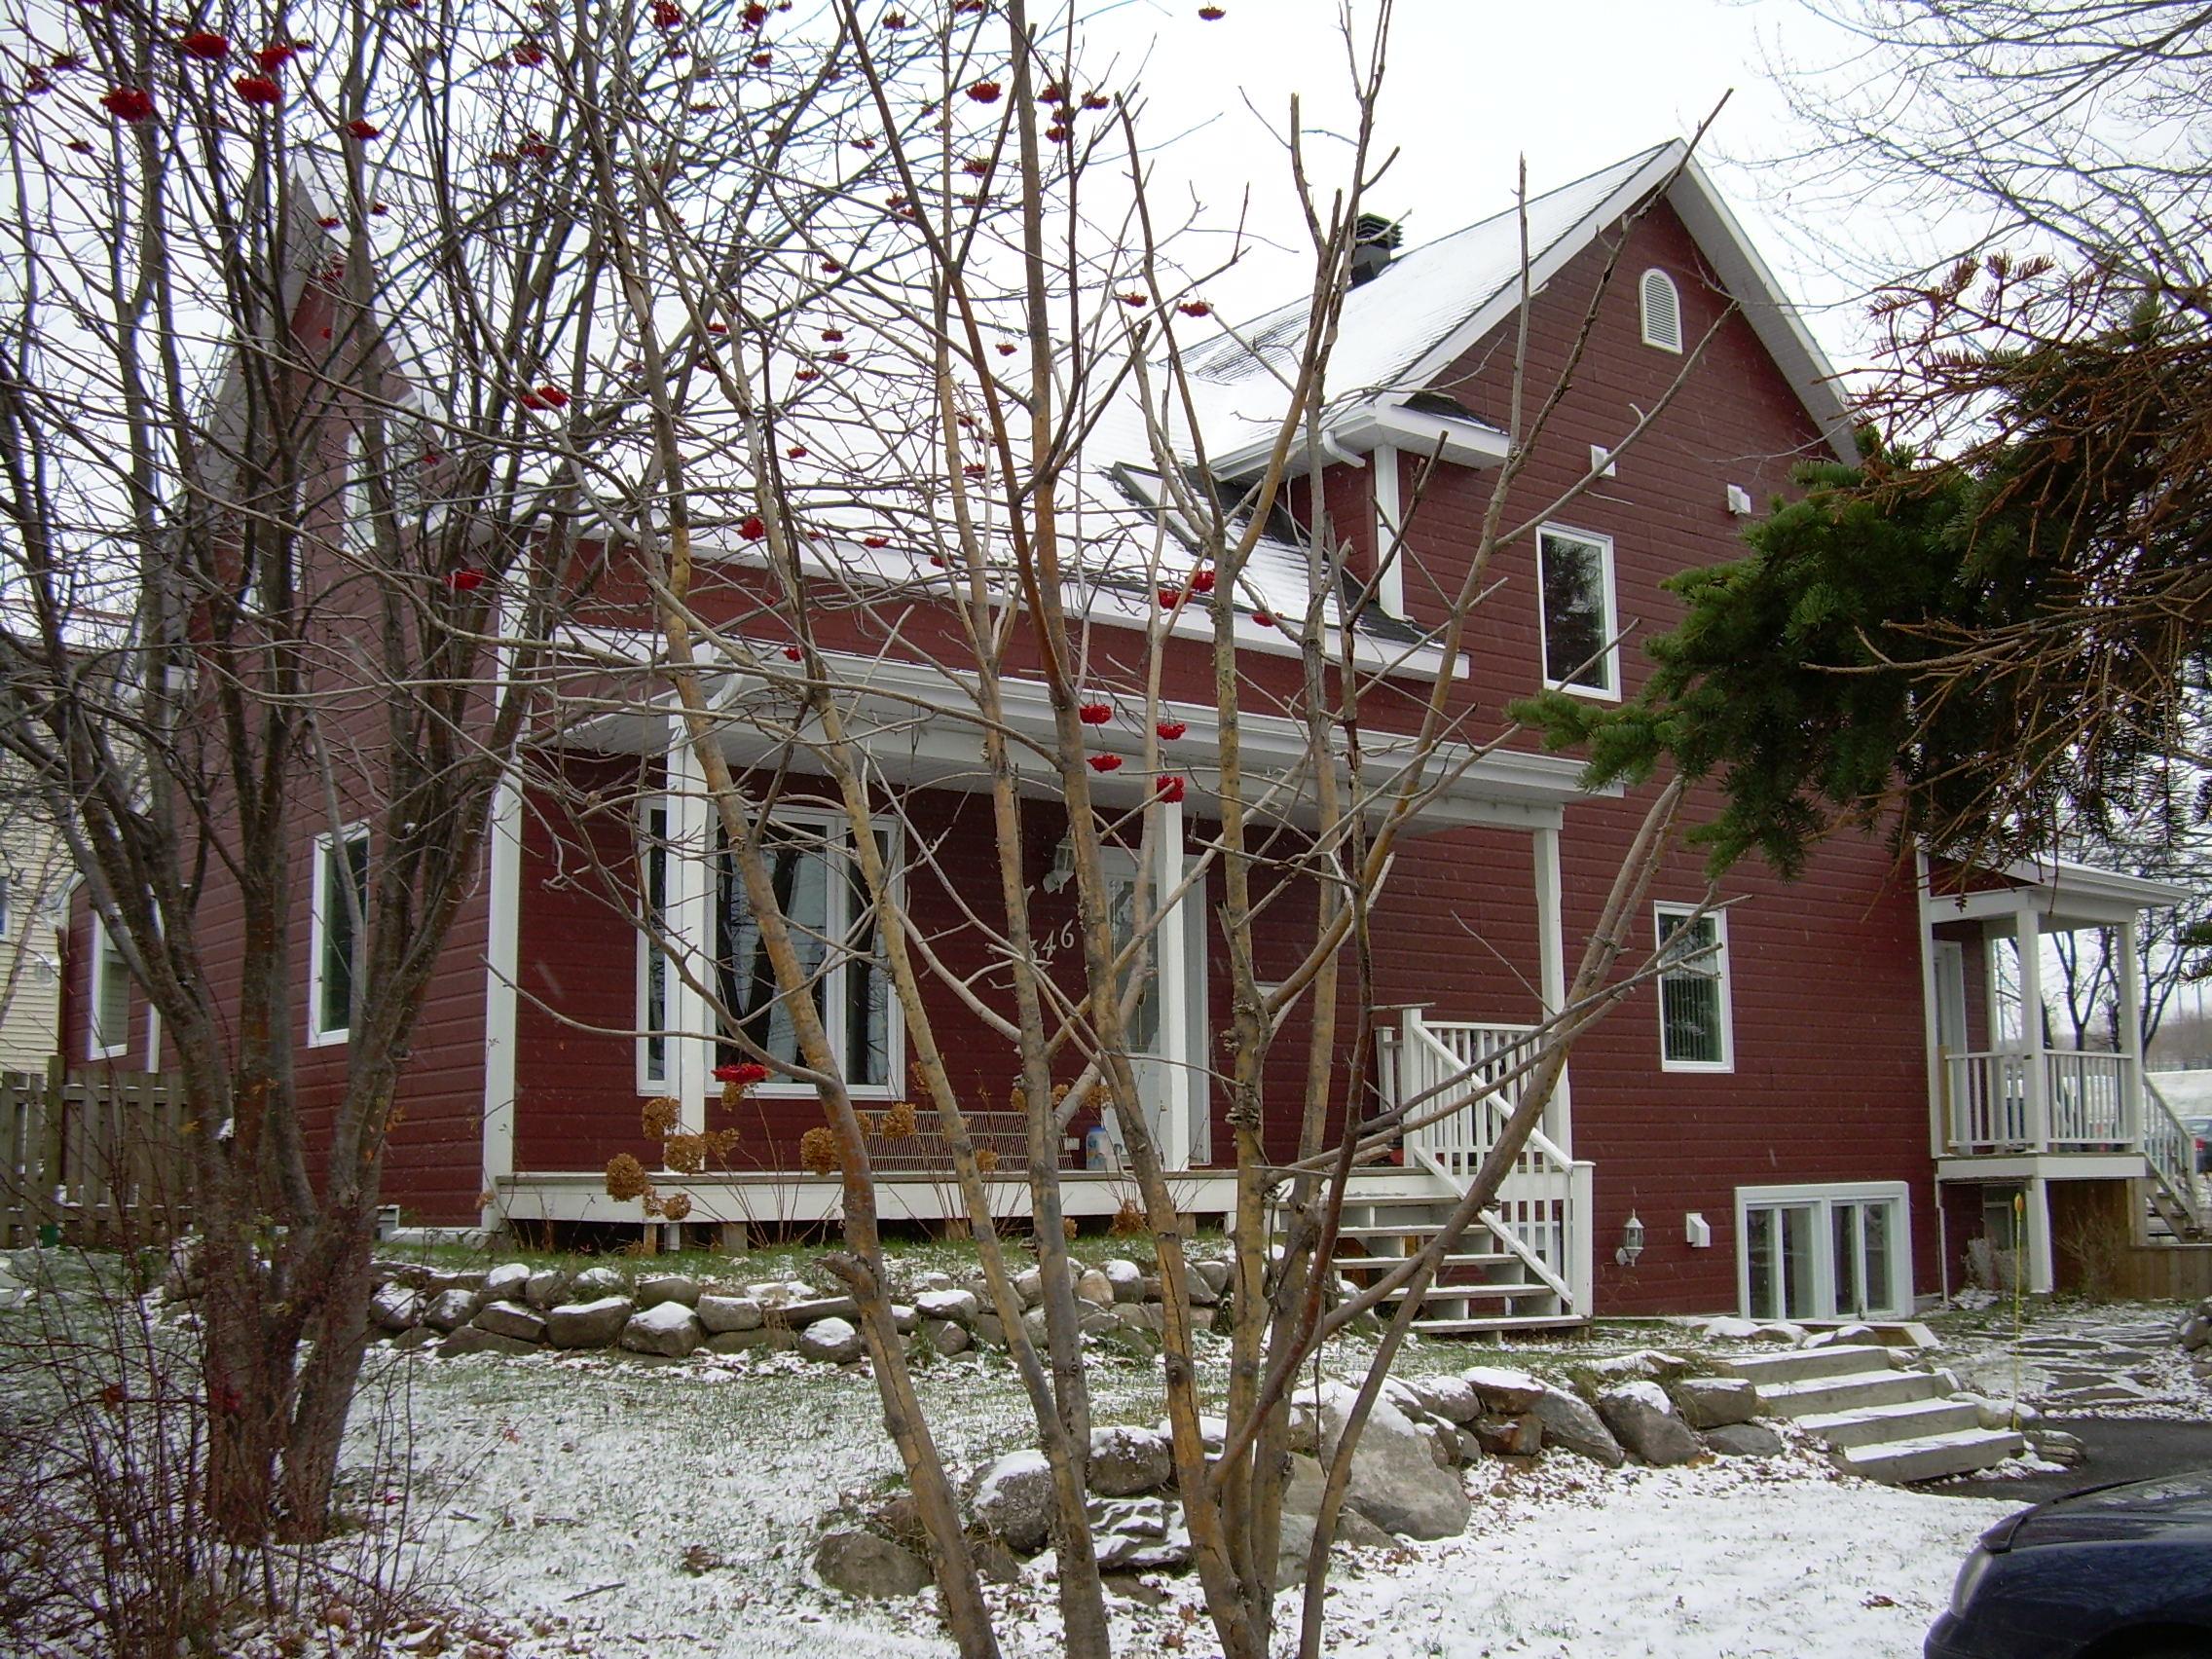 1204 - 346, avenue Rouleau